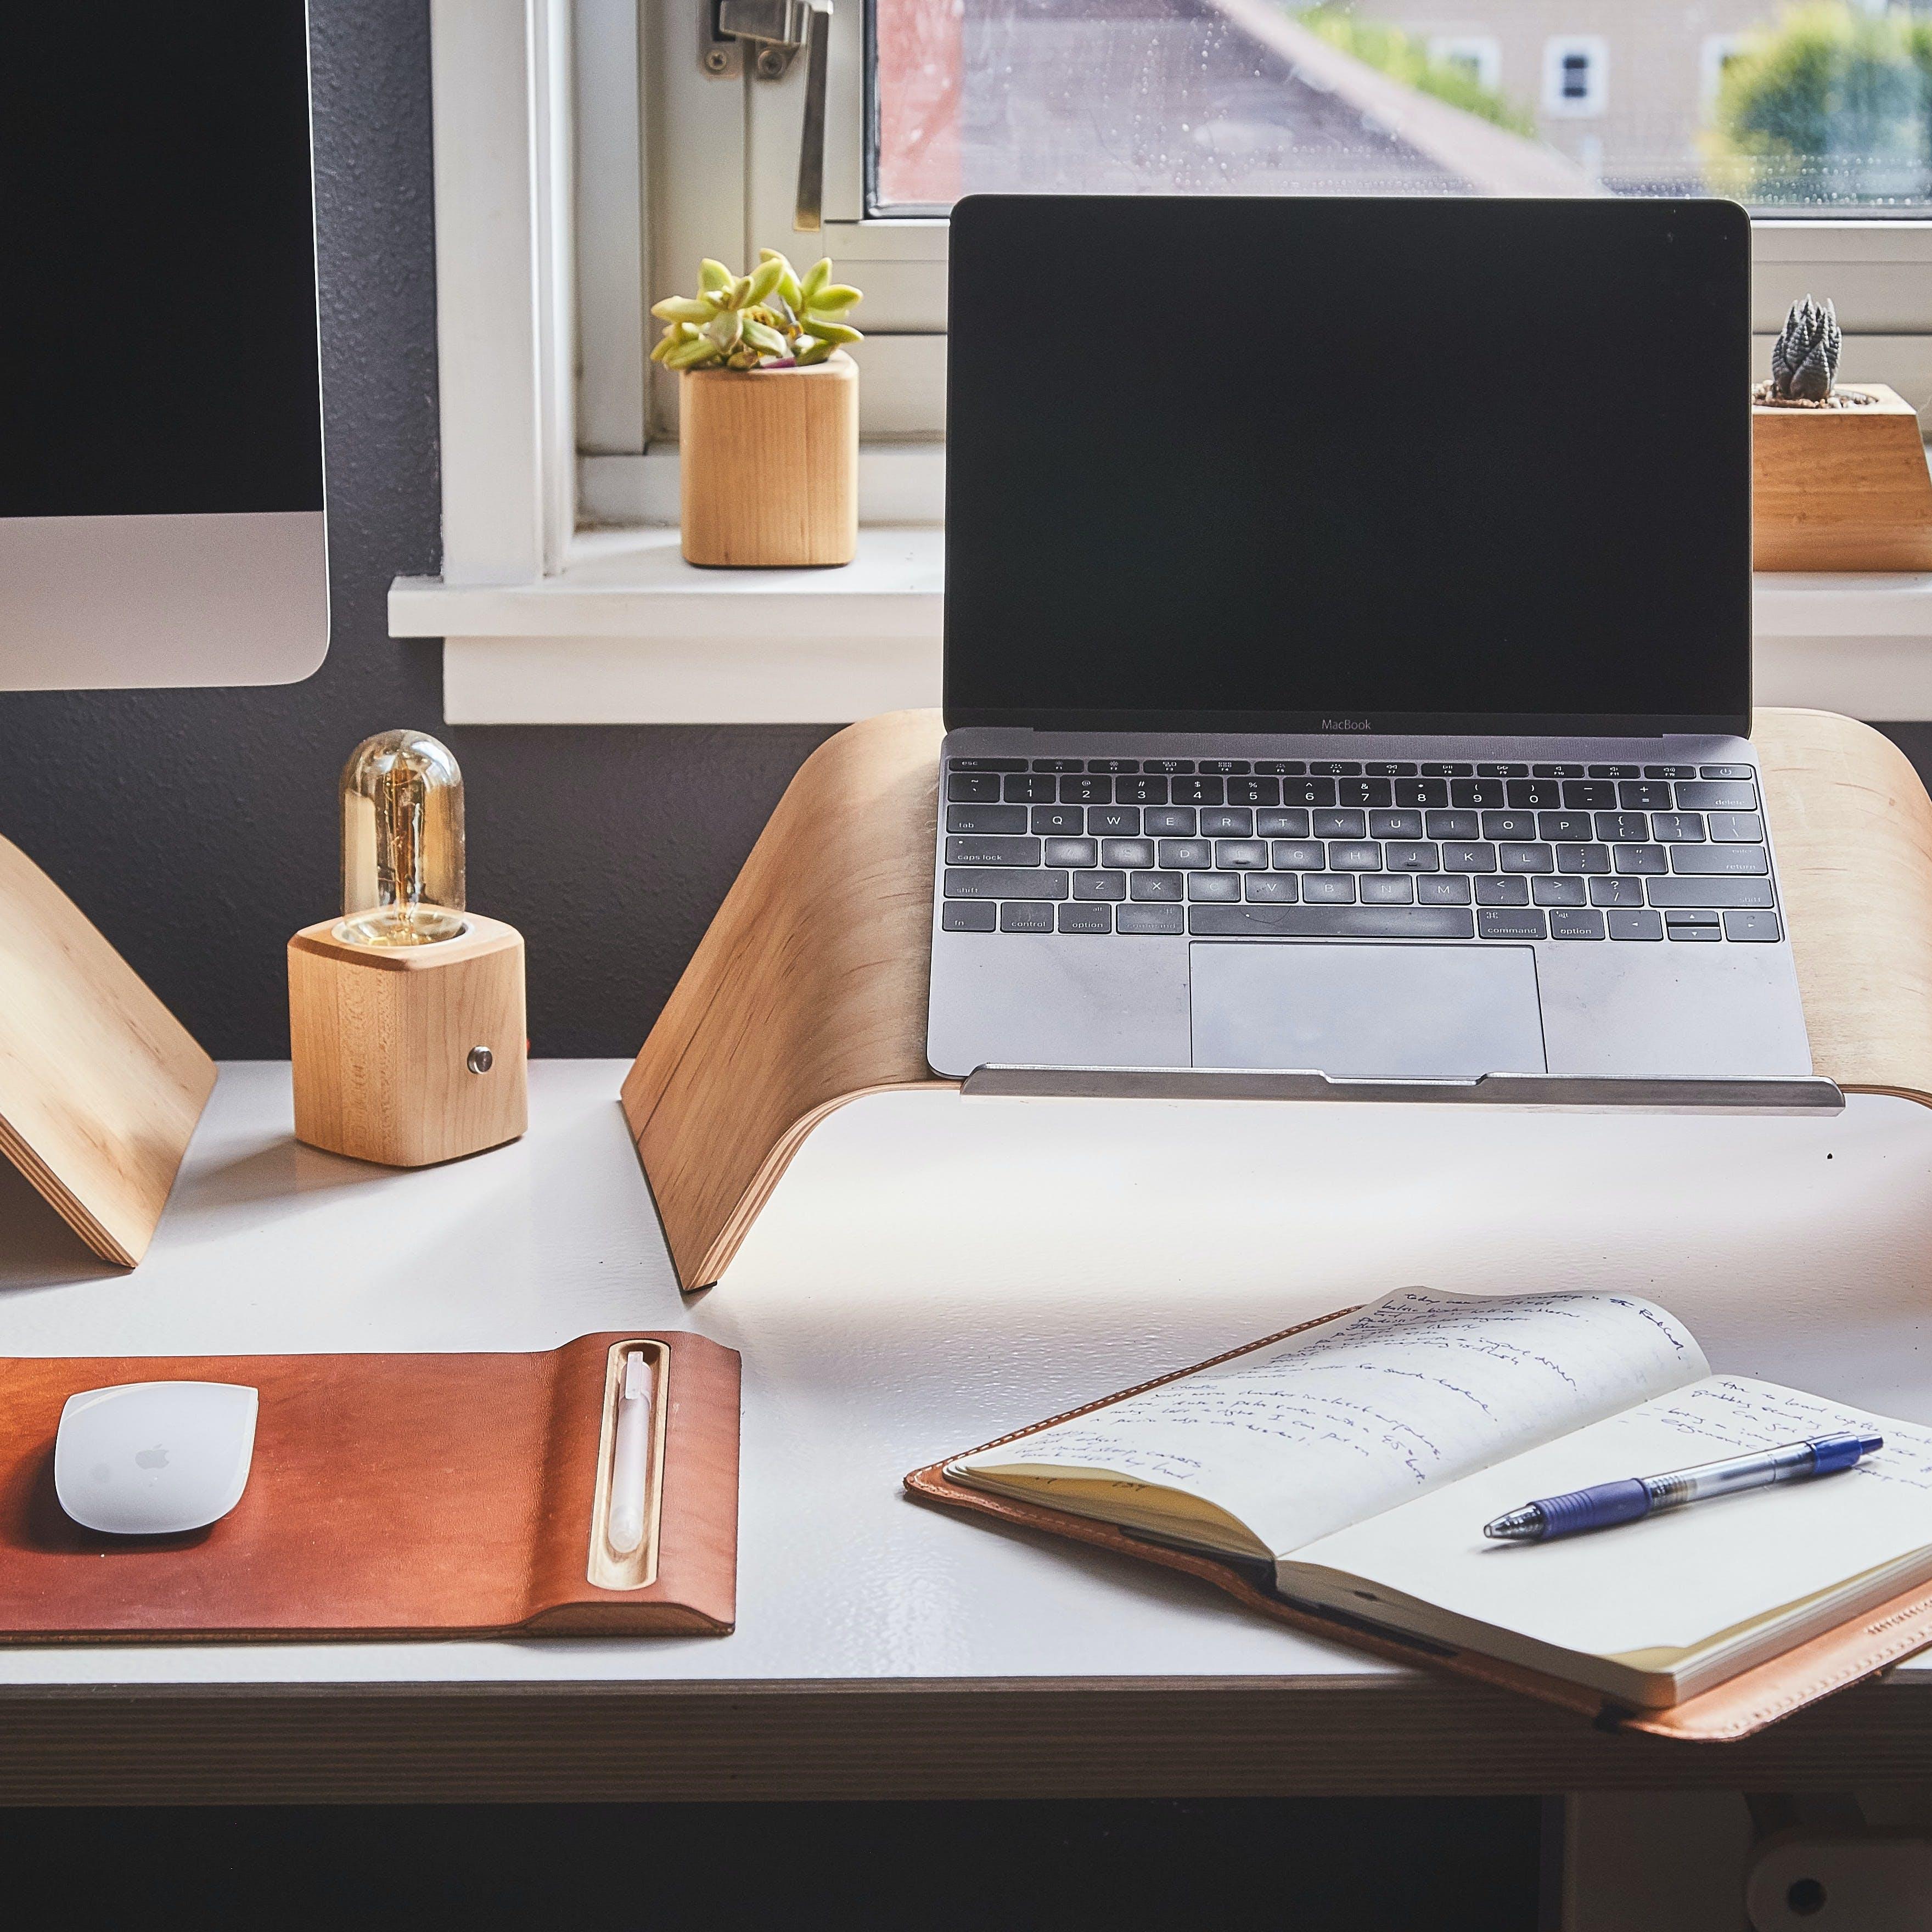 Desk,Furniture,Computer desk,Product,Table,Office,Interior design,Coffee table,Shelf,Room